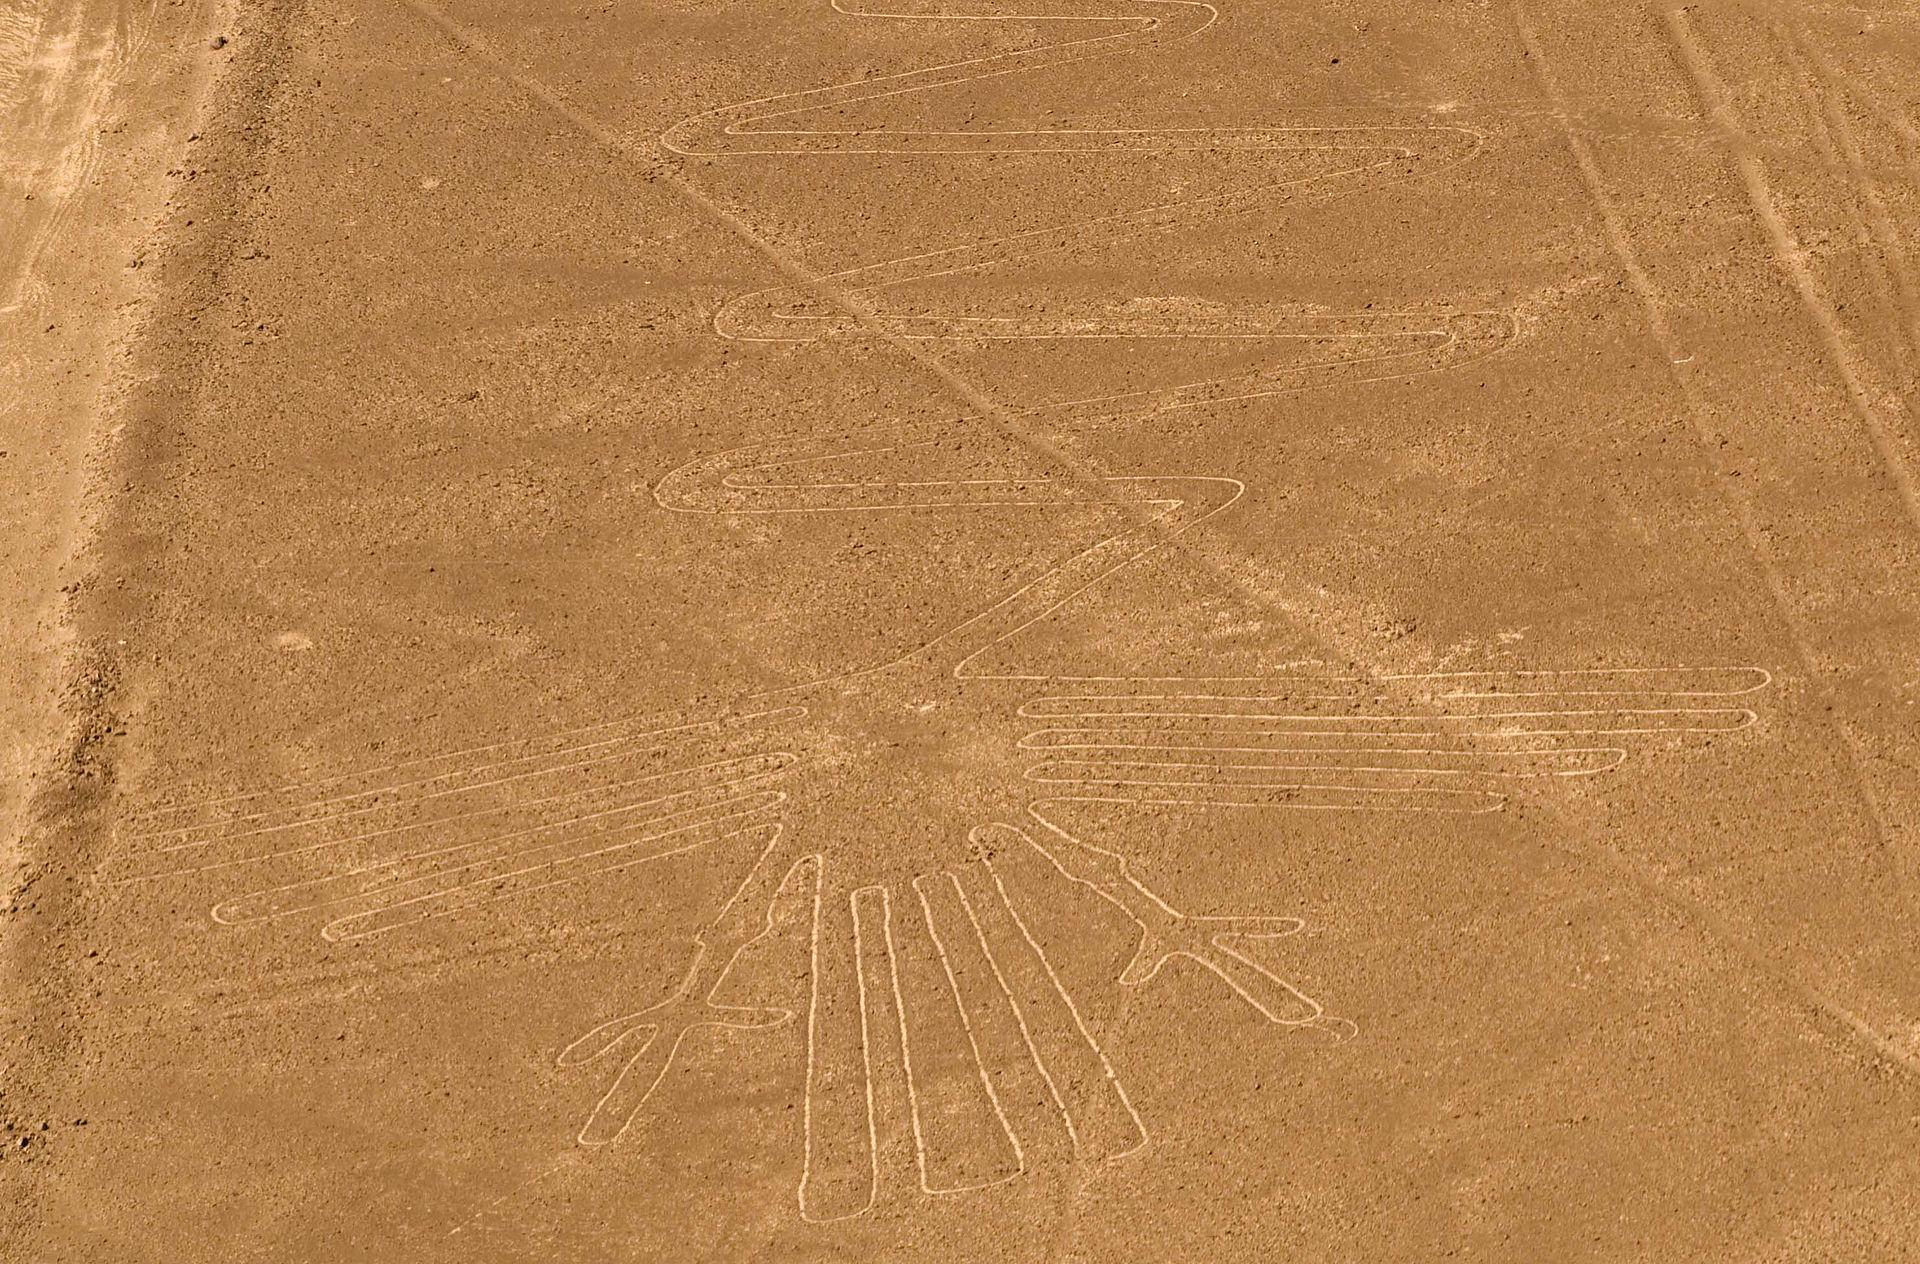 Lignes_de_Nazca_oiseau